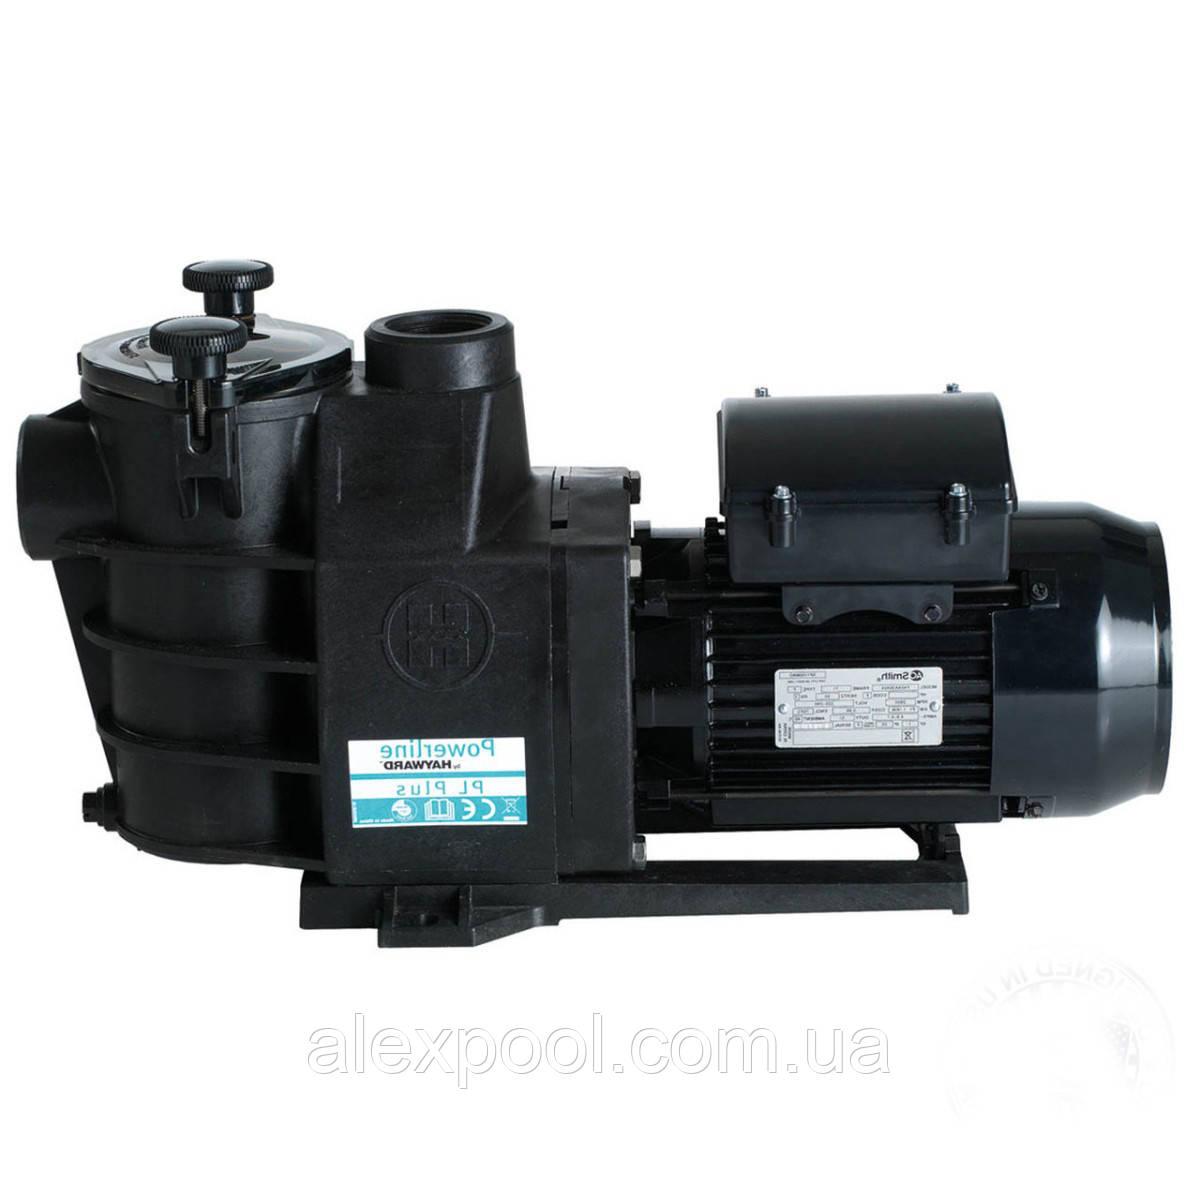 Hayward PL Plus 81033 Насос для бассейна (220В, 15.7 м³/час, 1.5HP)